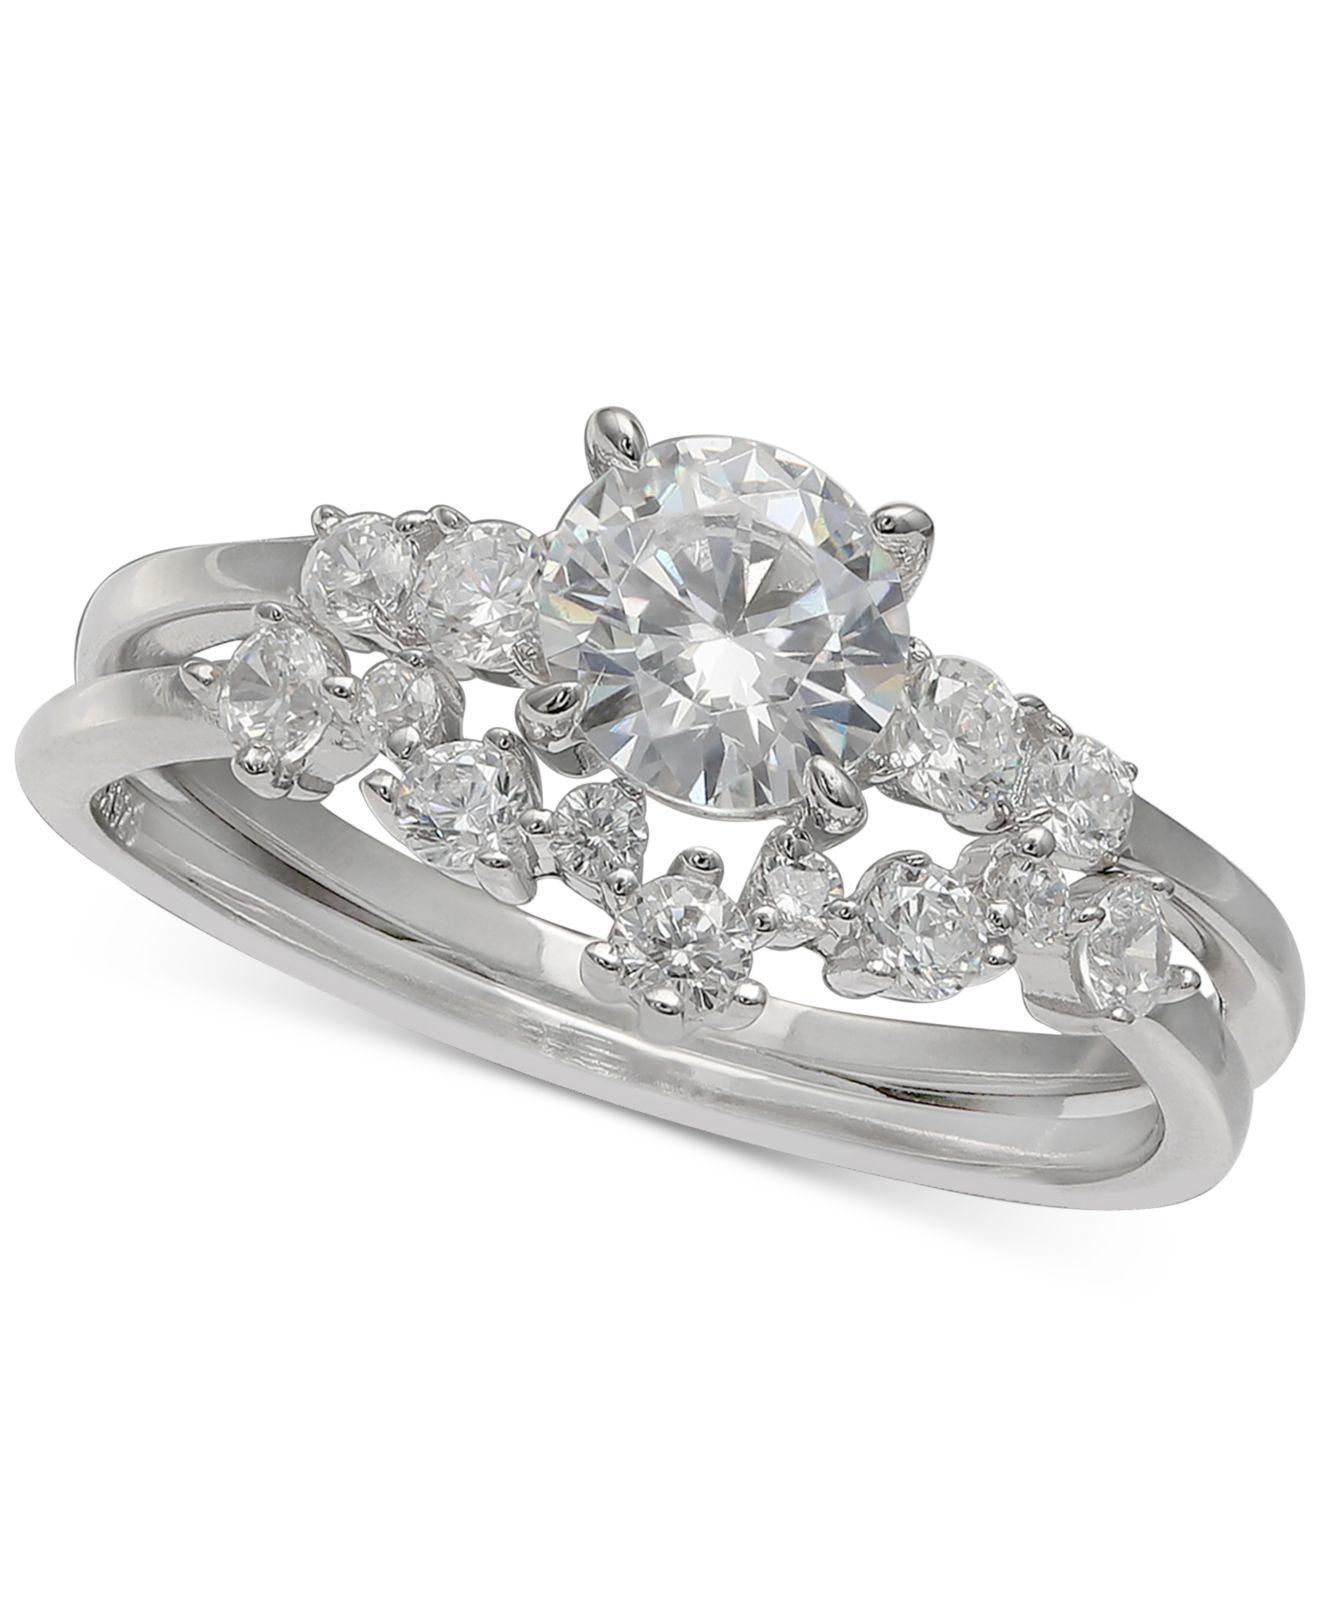 cb8ba267619e6 Lyst - Giani Bernini Cubic Zirconia Bridal Set In Sterling Silver ...